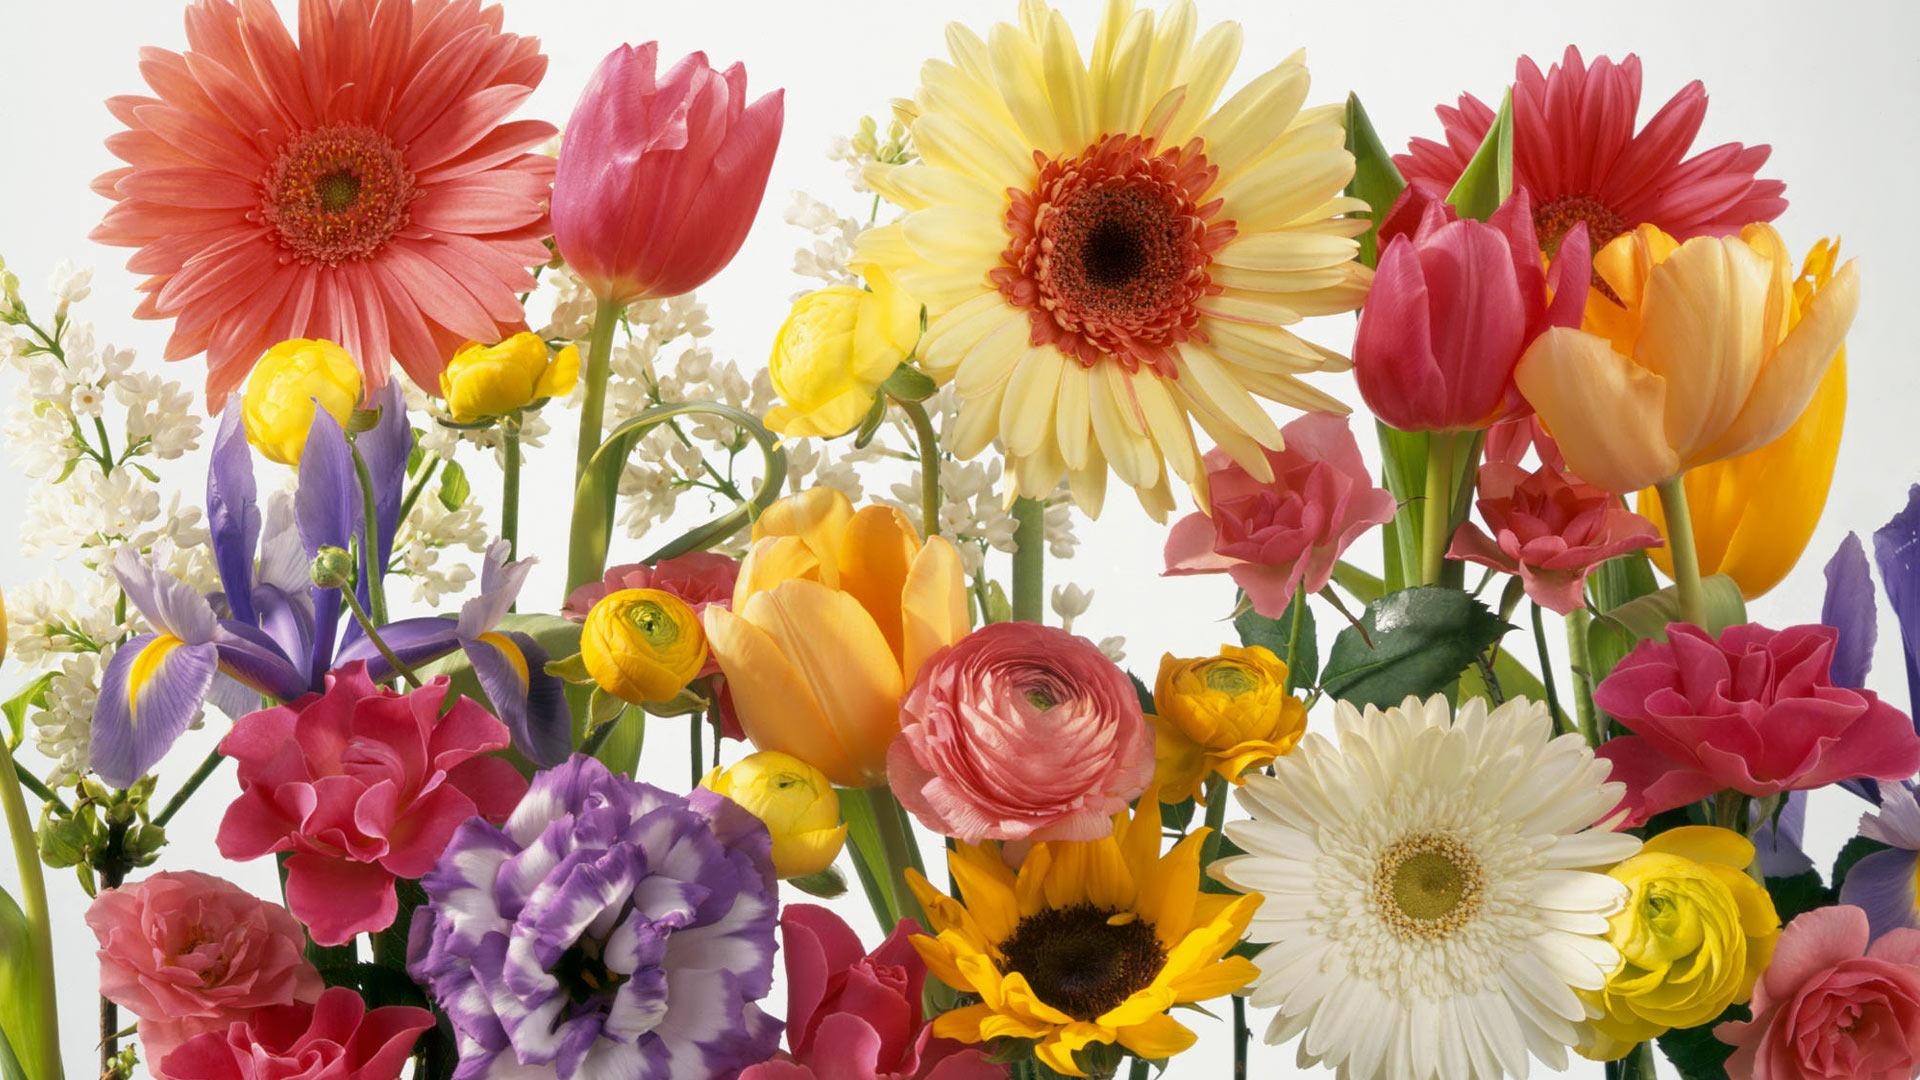 Flower Spring Wallpaper spring wallpapers hd 1920x1080